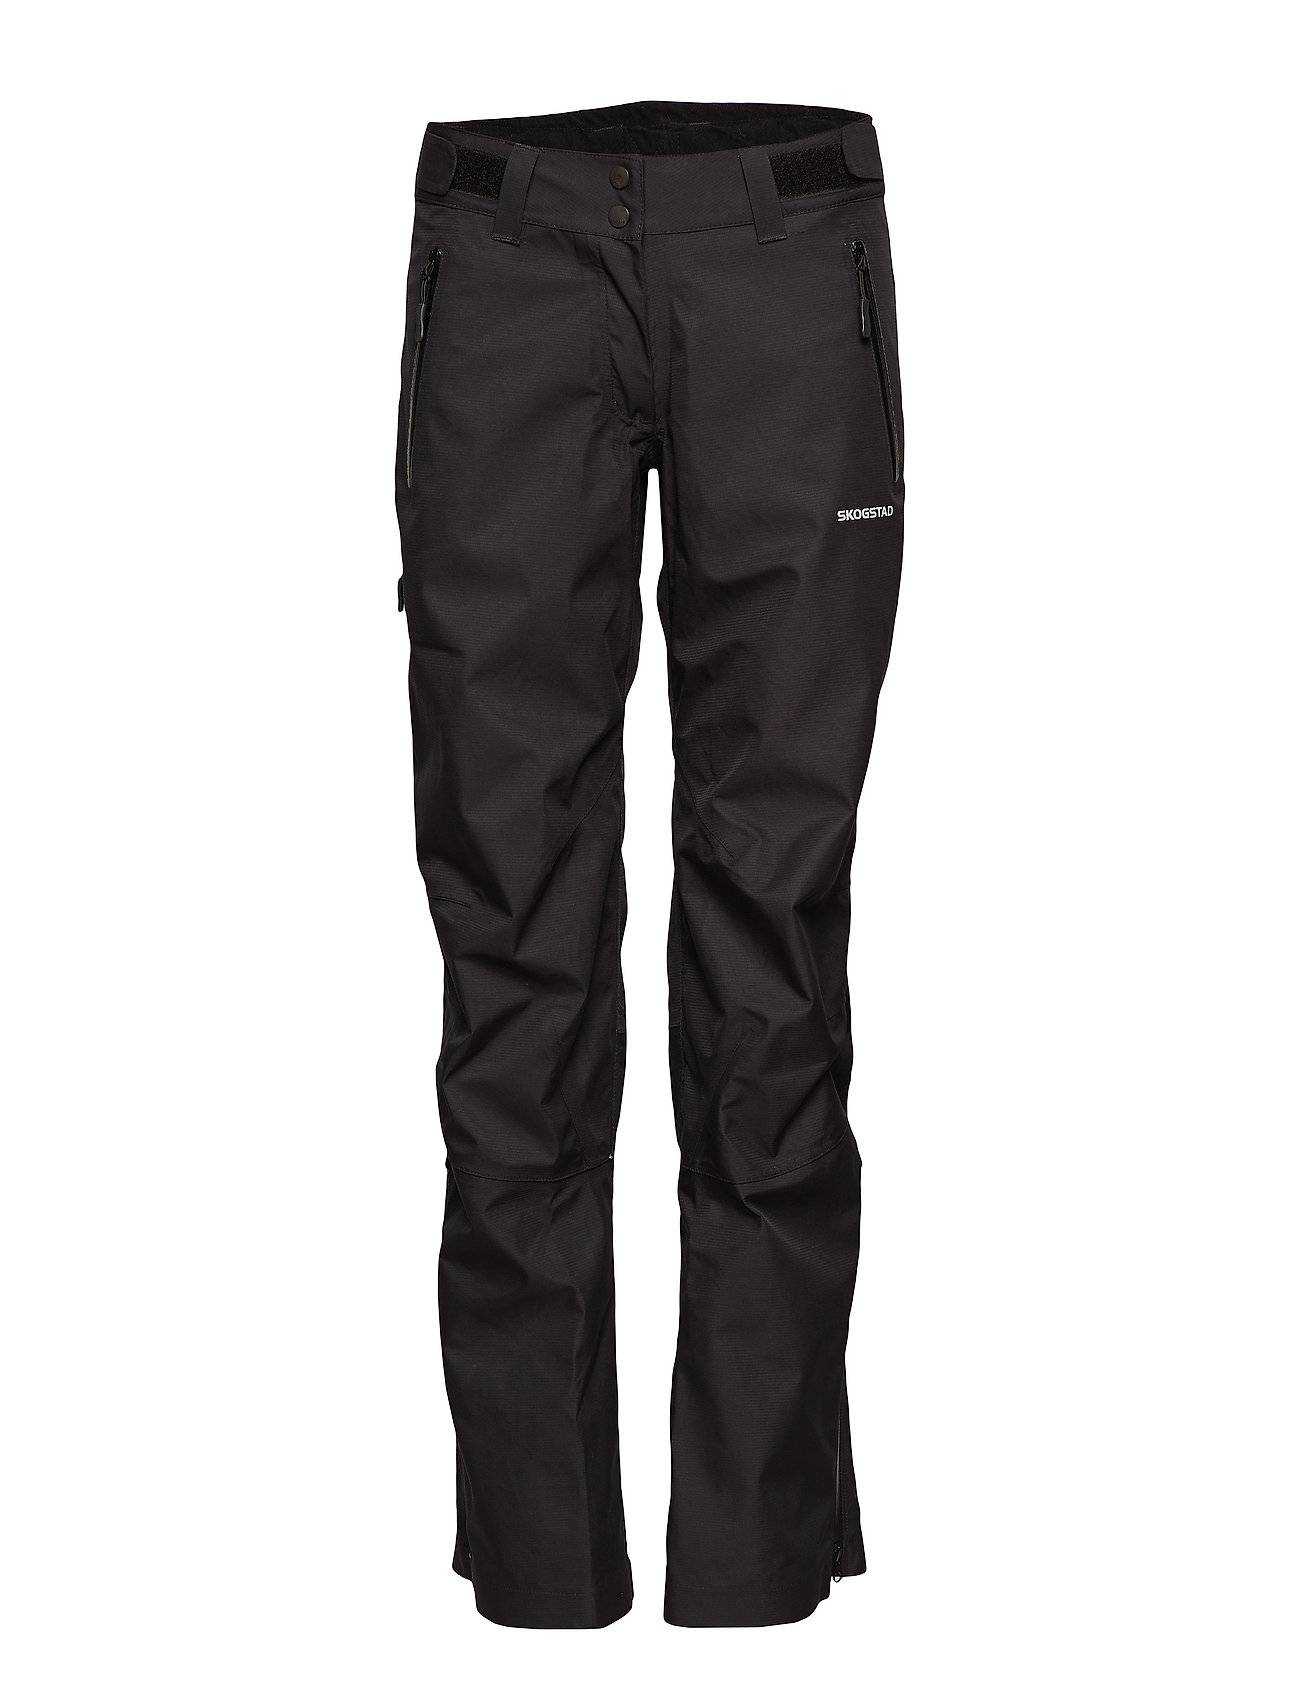 Skogstad Steigen 3-Layer Technical Shell Trouser